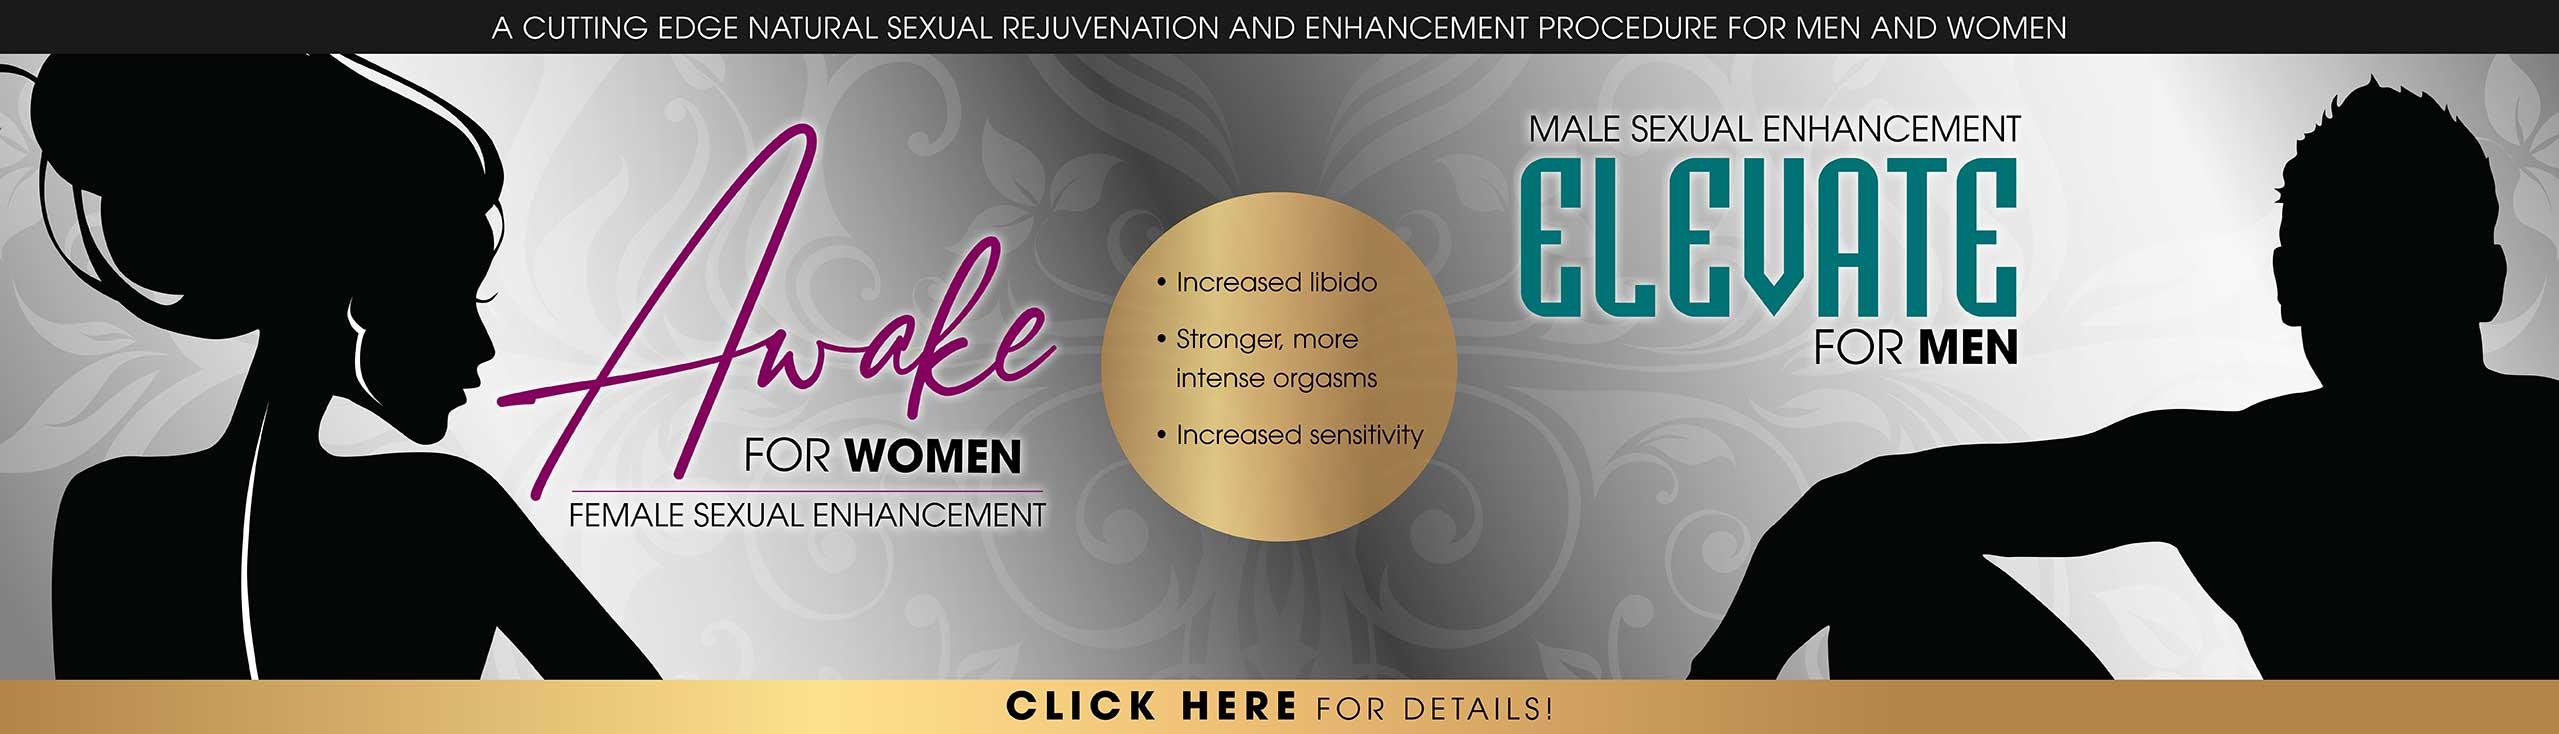 AWAKE_ELEVATE_WEB_HEADER_081621